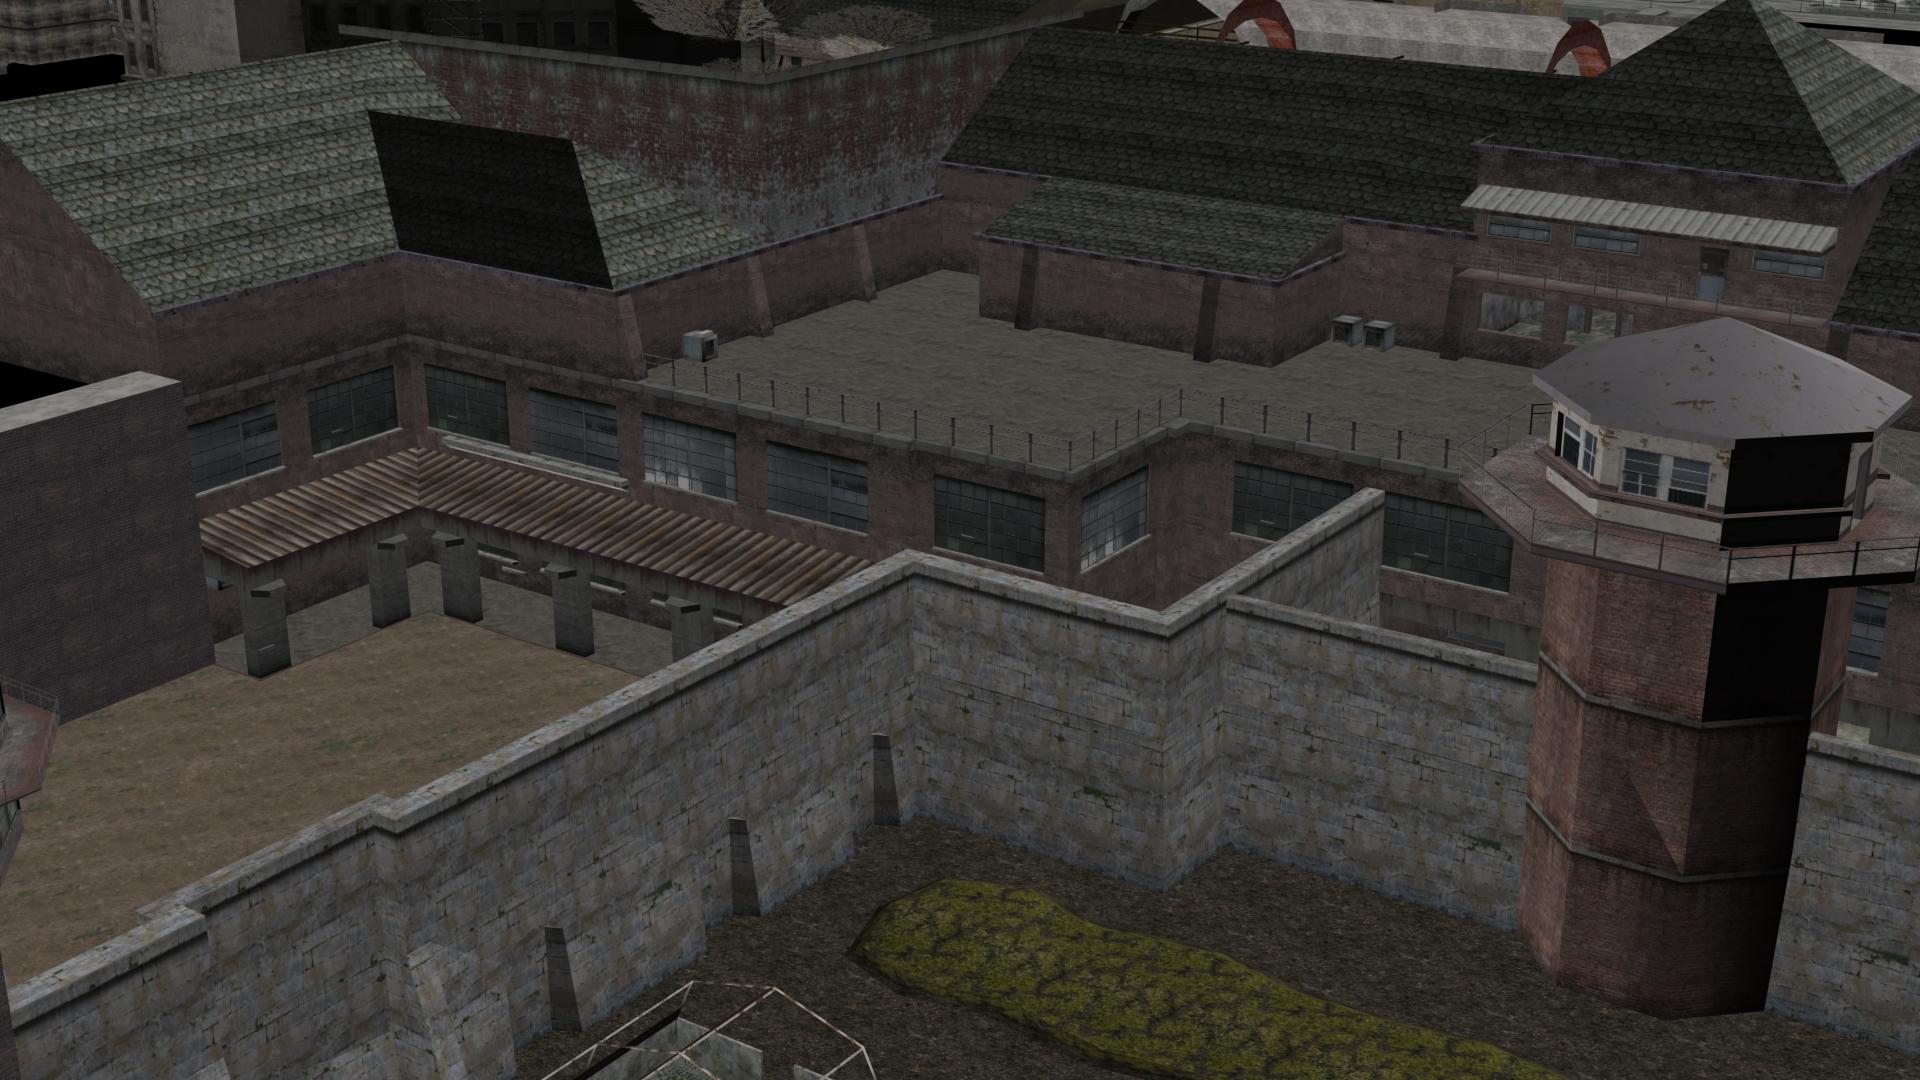 carcer_prison_sorting_6.png